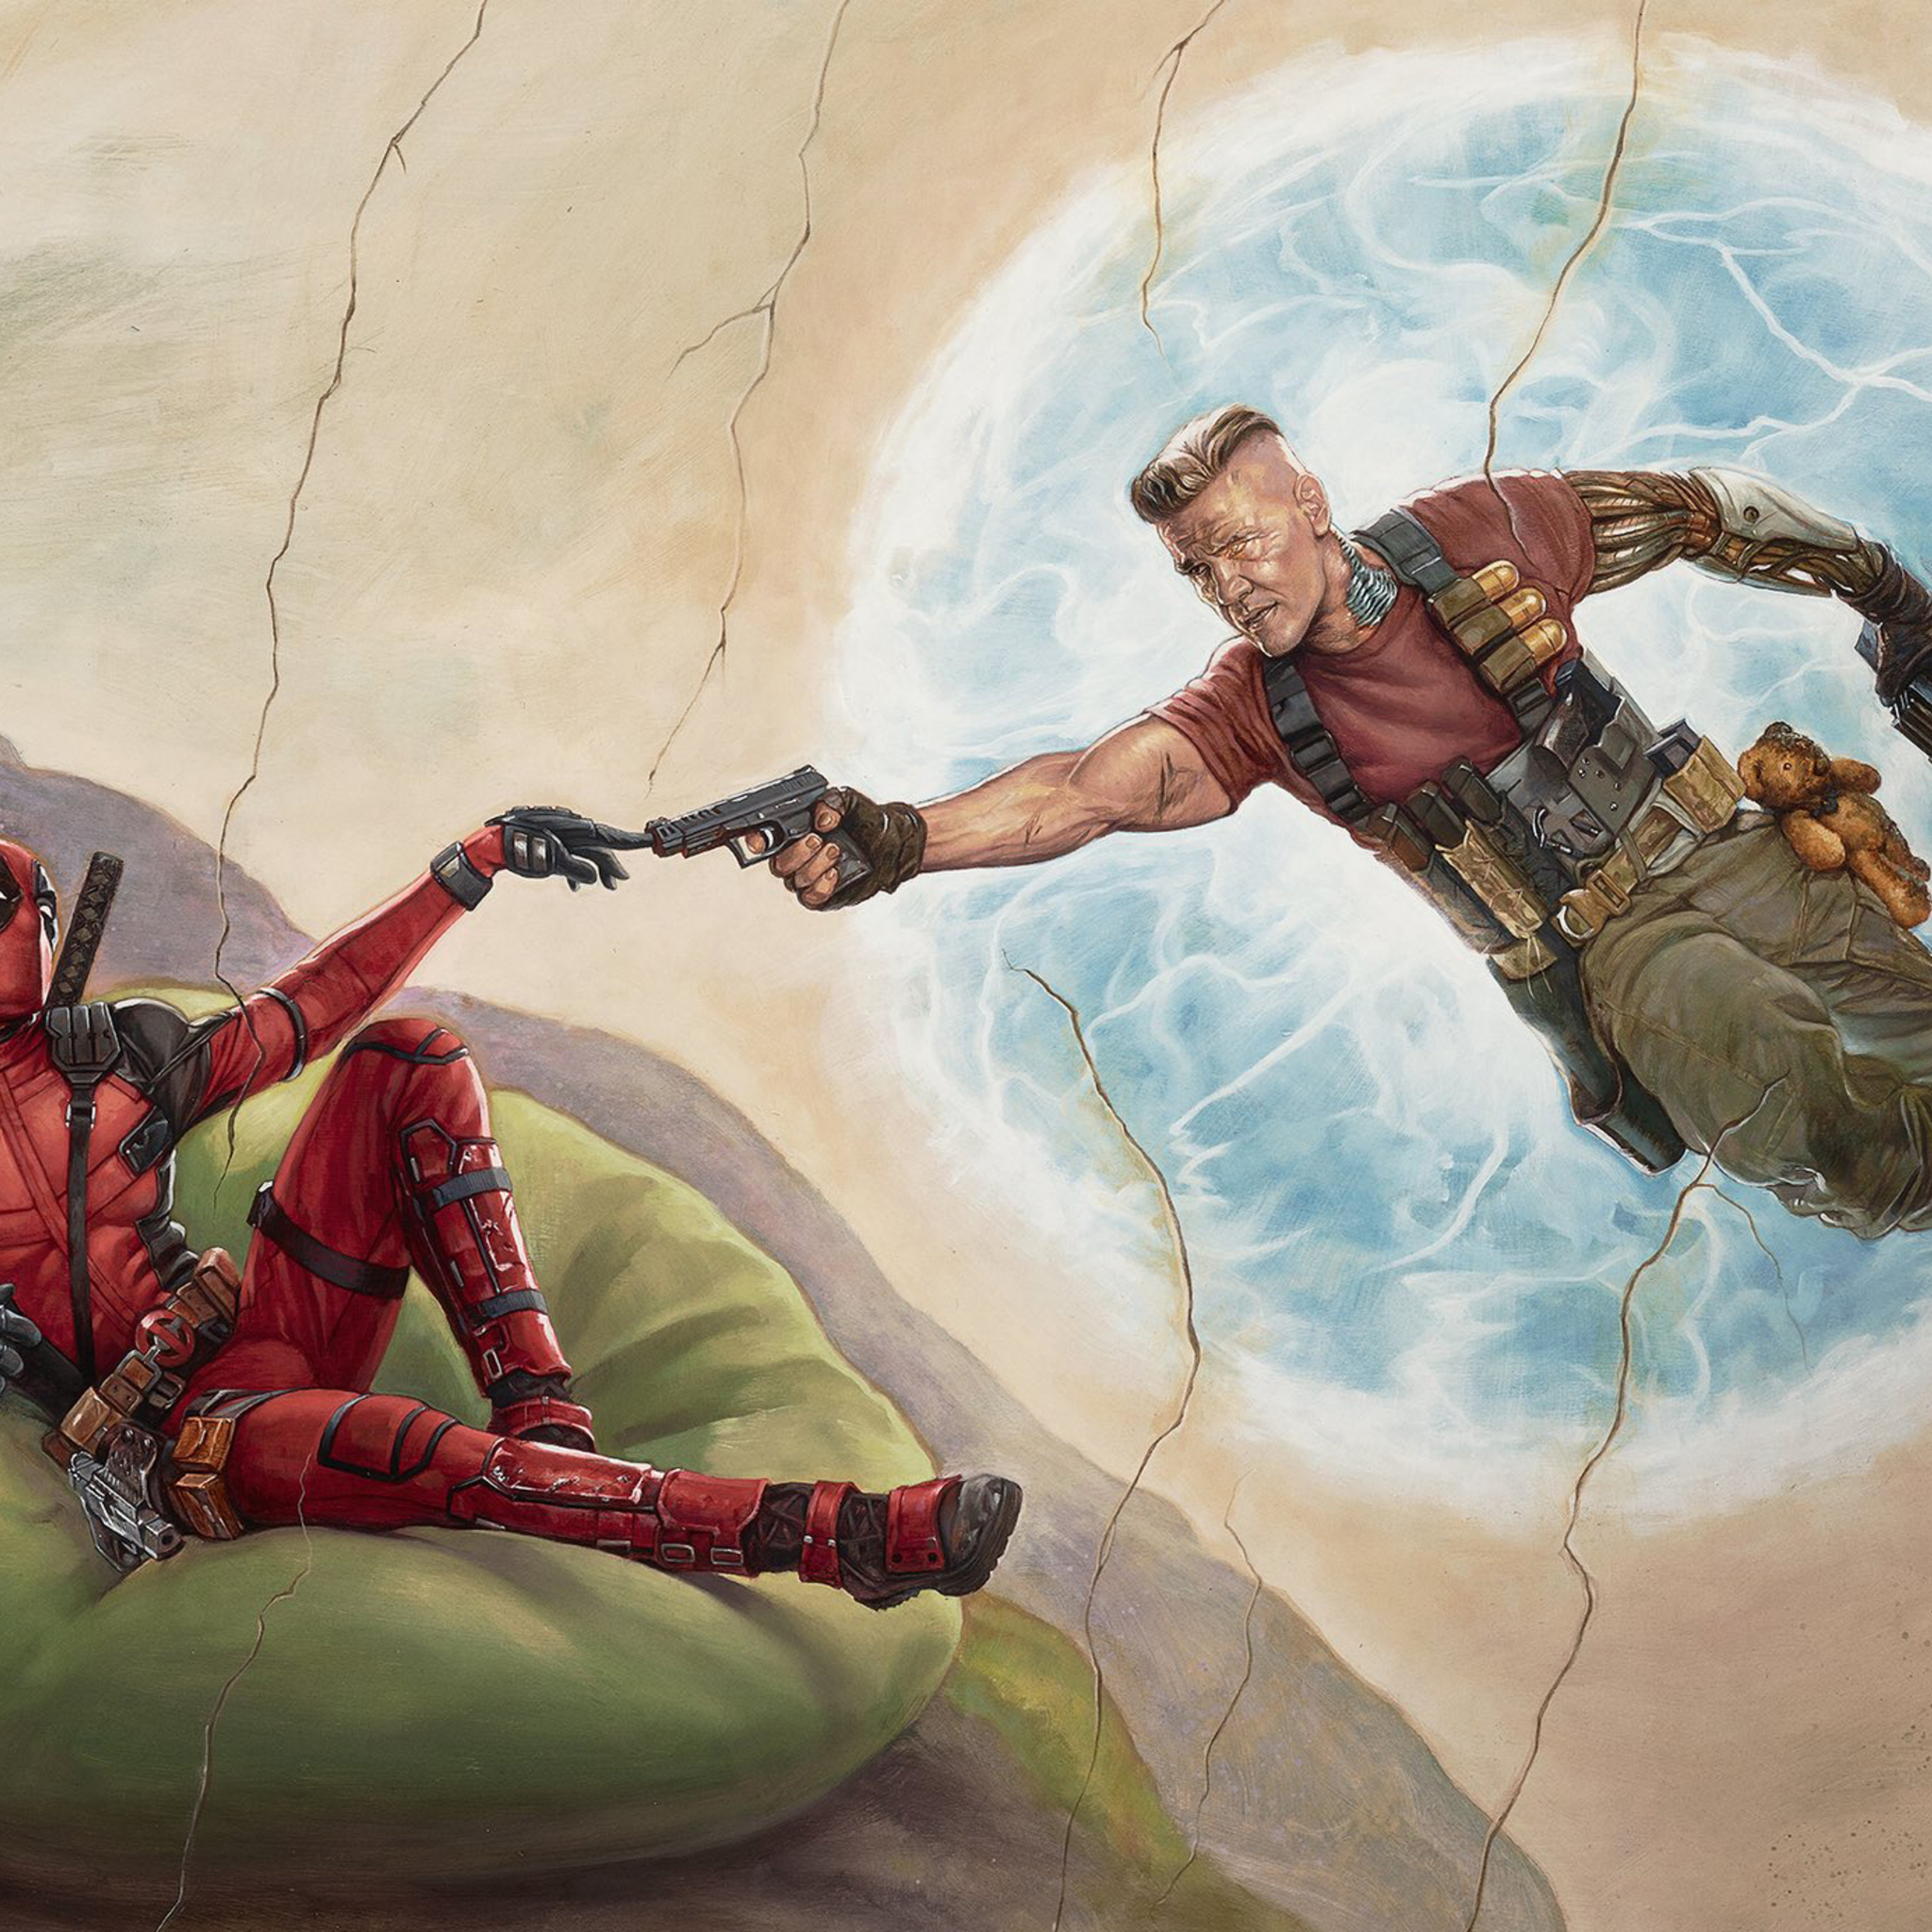 2048x2048 Deadpool 2 2018 Movie Poster Ipad Air HD 4k